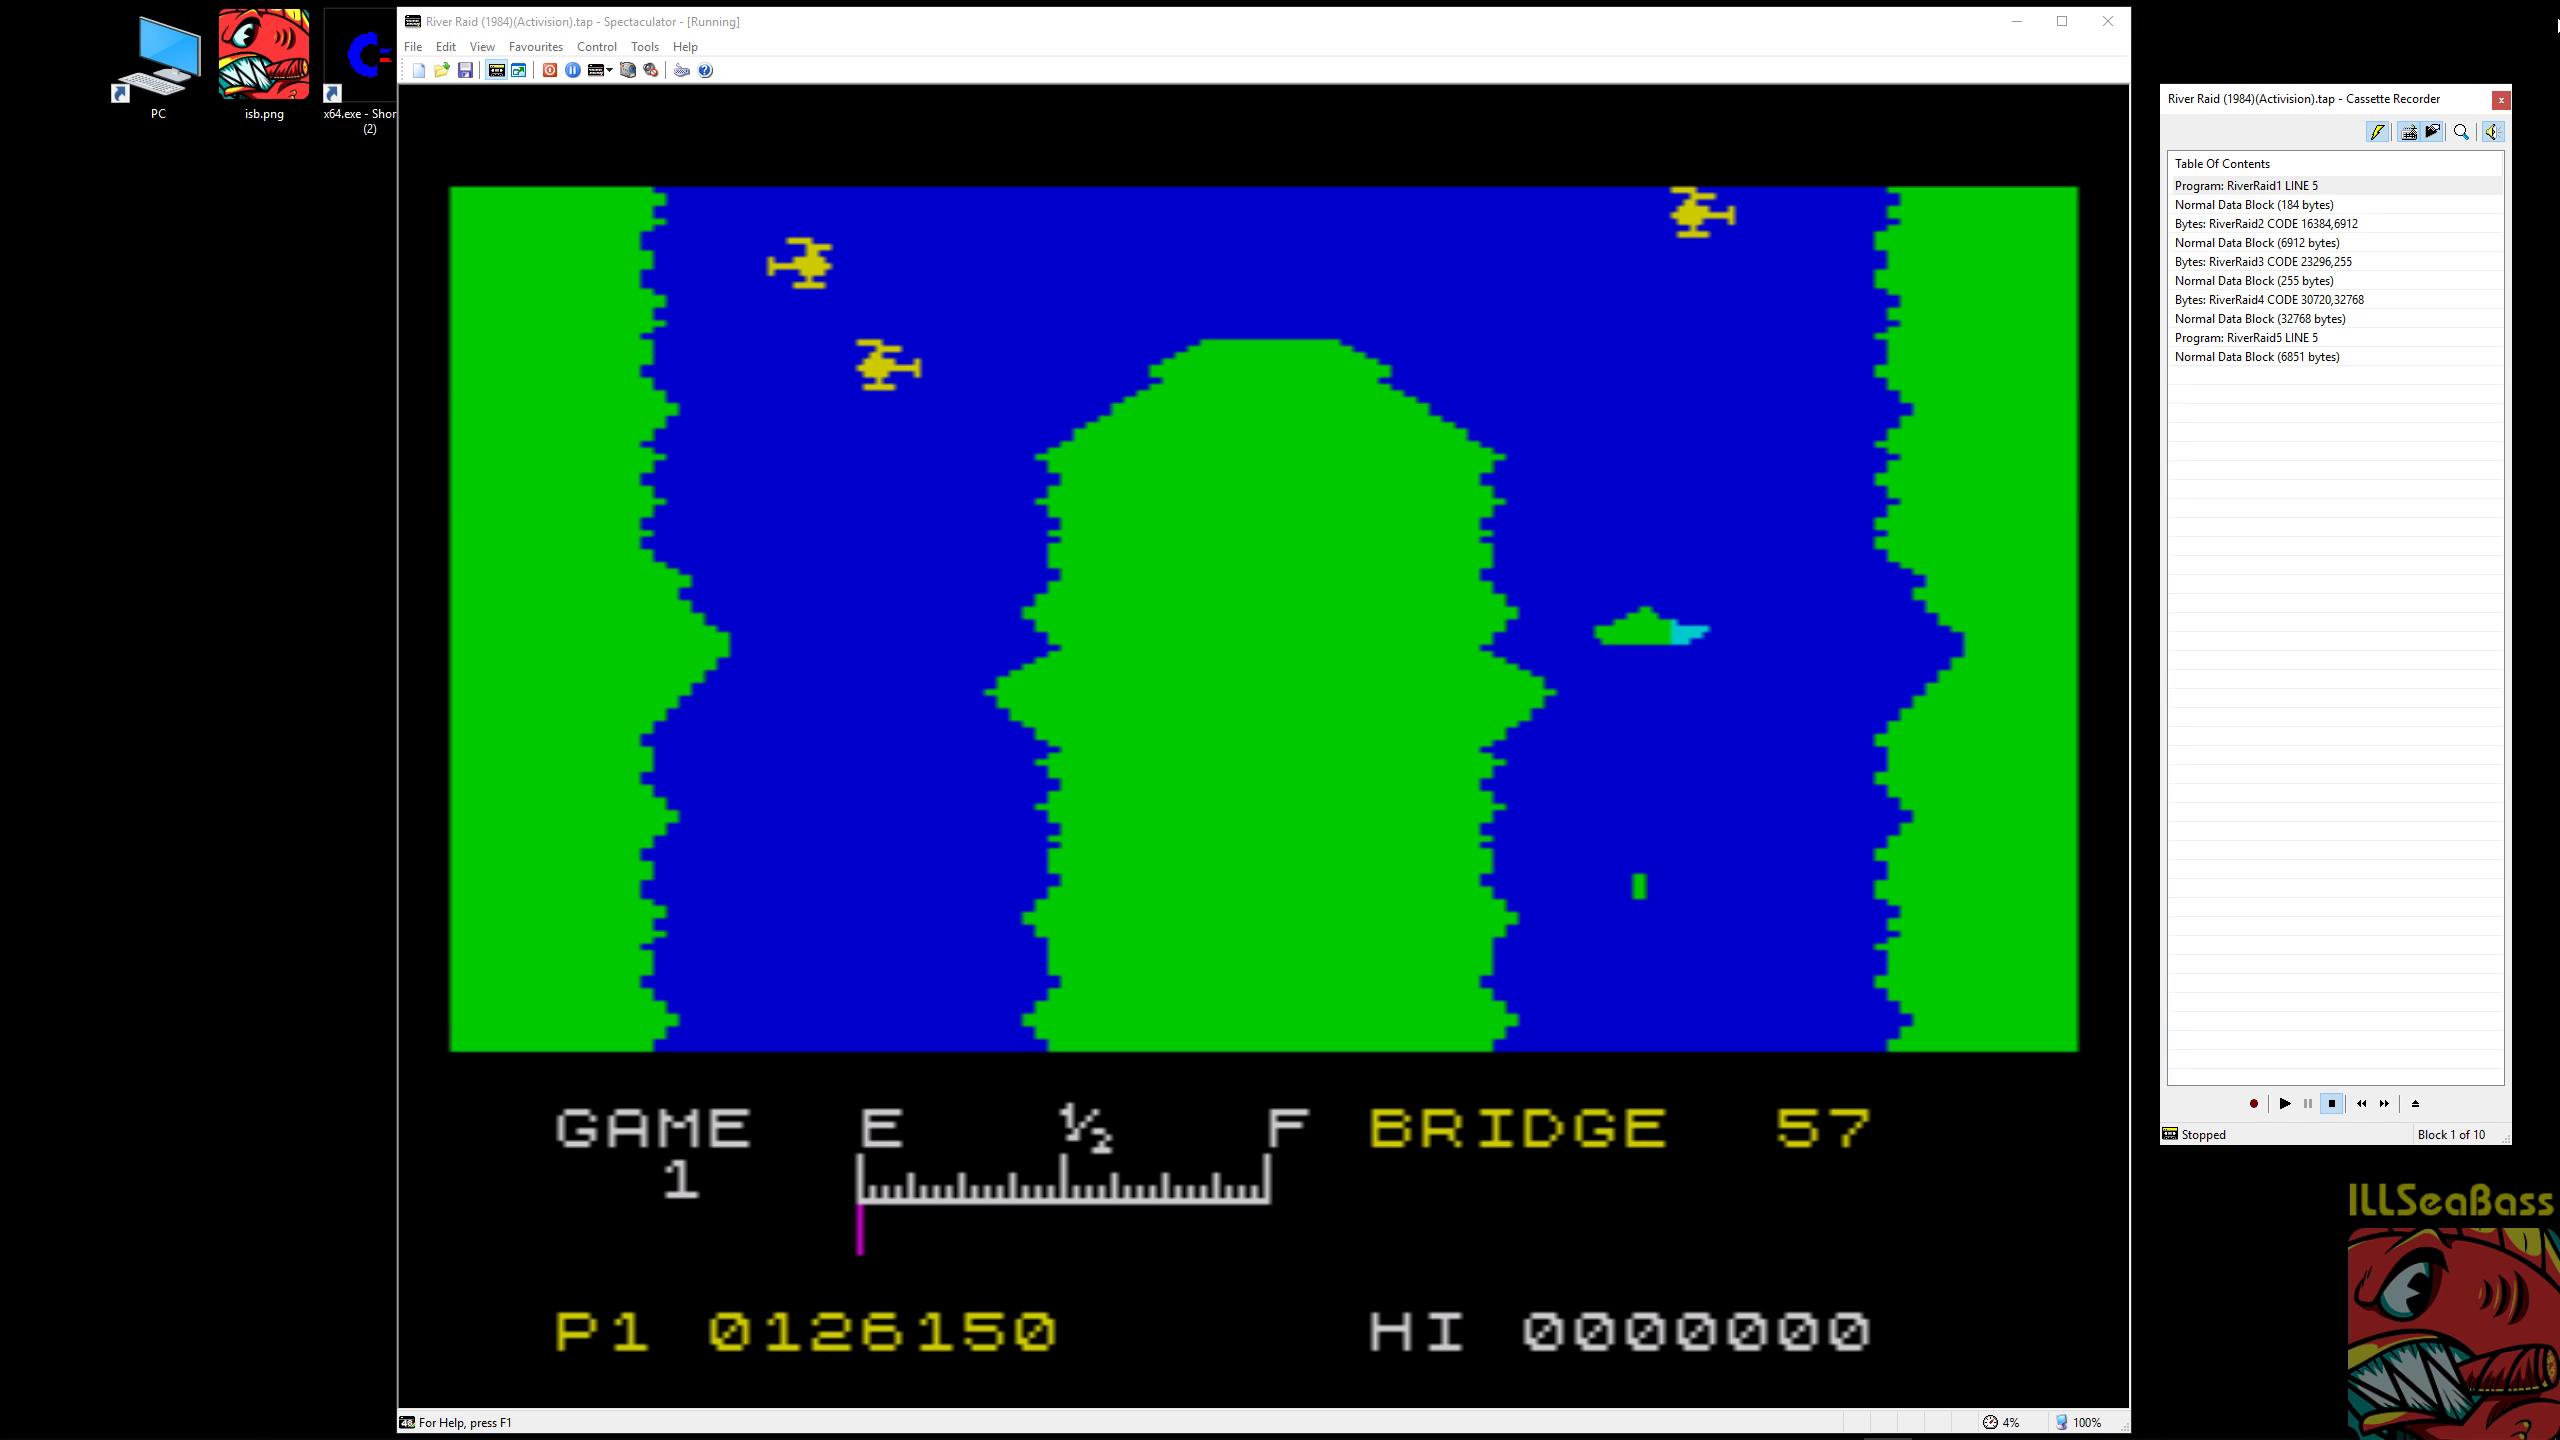 ILLSeaBass: River Raid (ZX Spectrum Emulated) 126,150 points on 2019-01-10 08:35:10